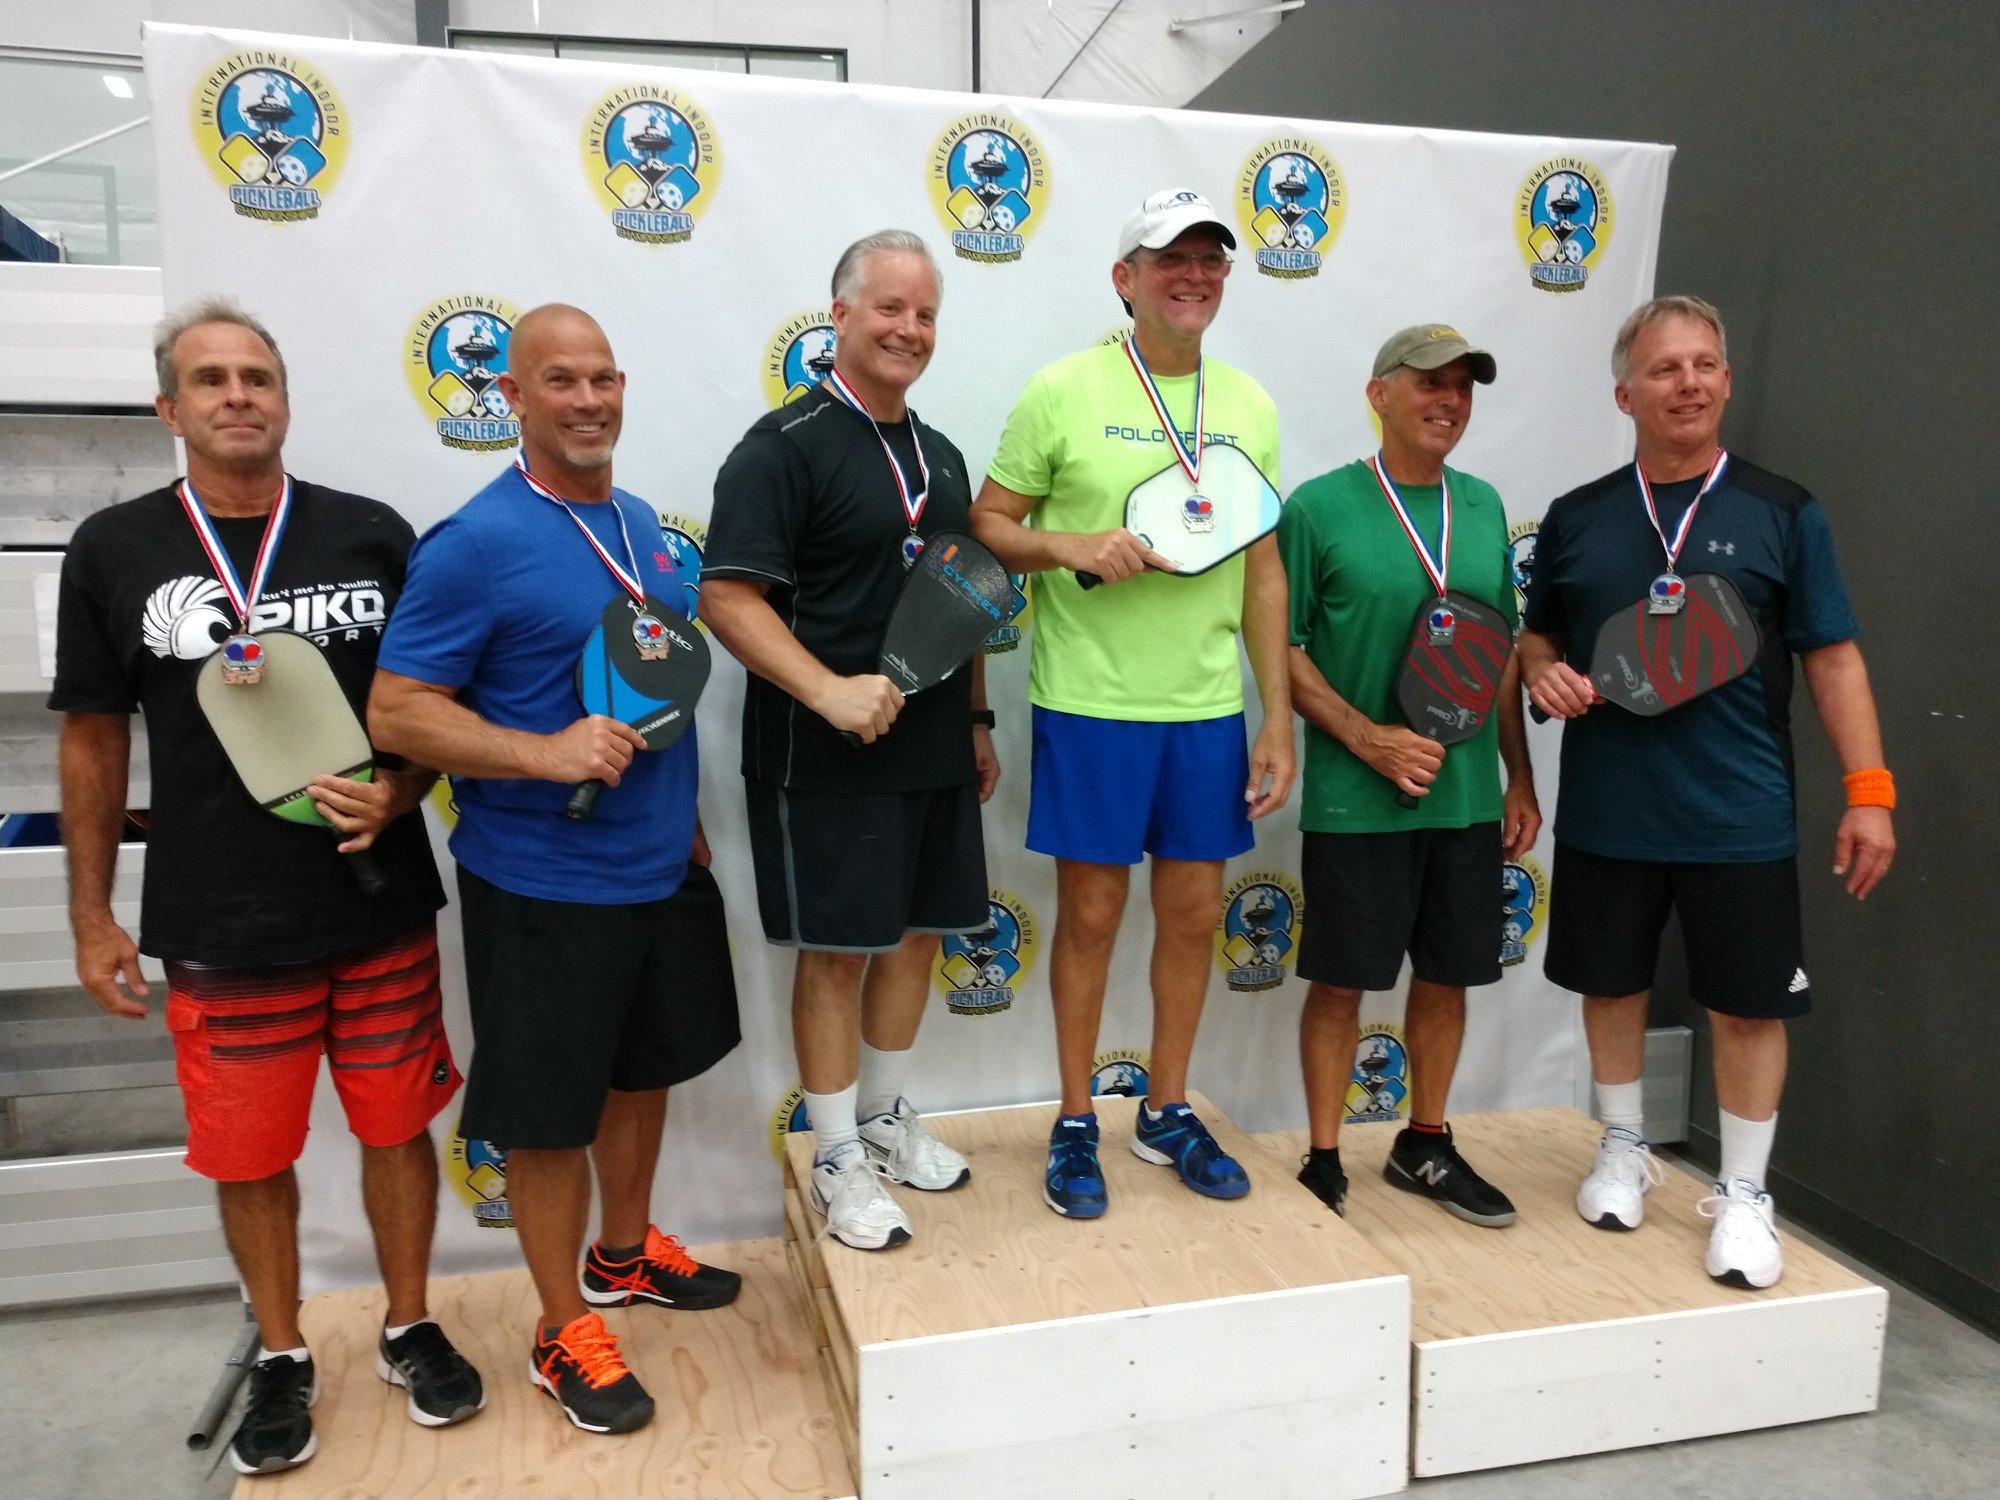 Men's Doubles 4.0, 50+Arvo Johnson/Lance Hunt - Silver